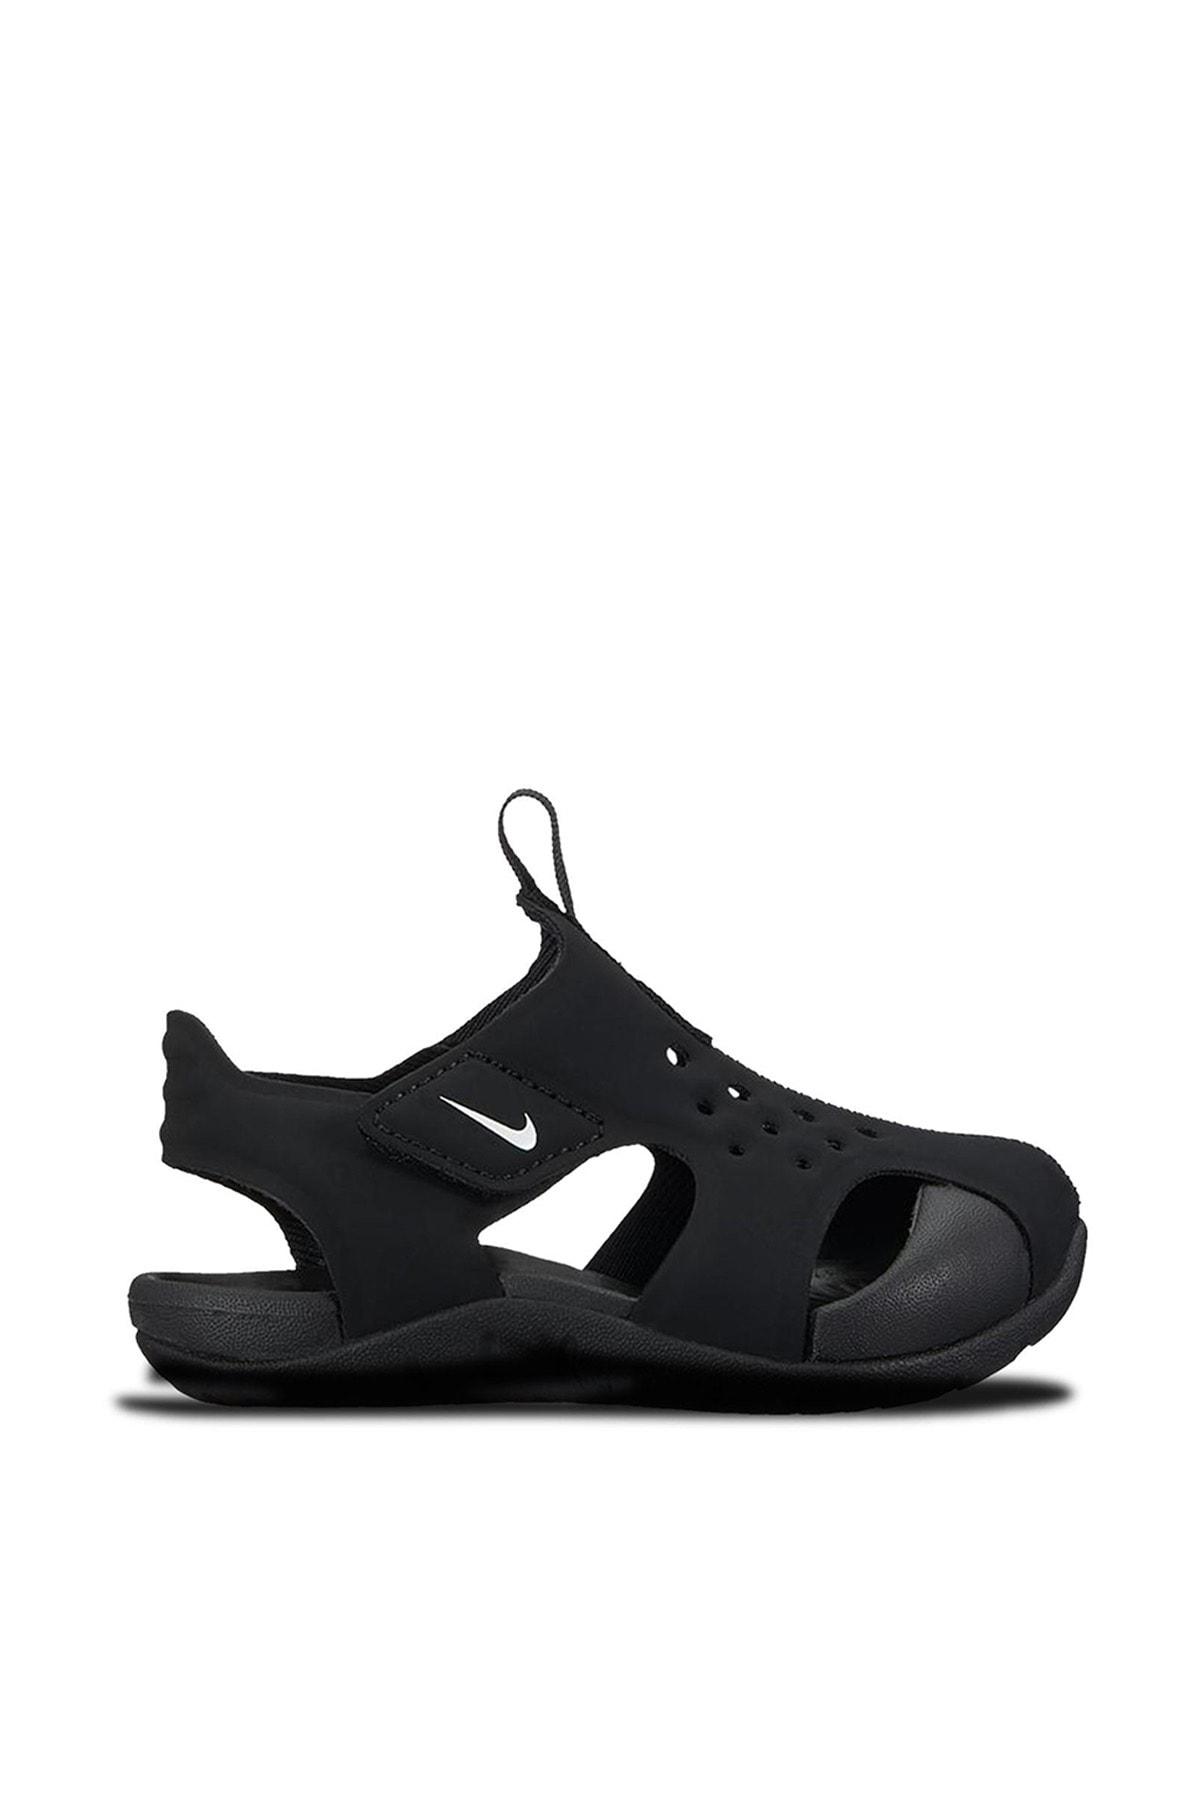 Nike Kids Siyah 943827-001 Sunray Protect 2 Havuz Deniz Bebek Sandalet